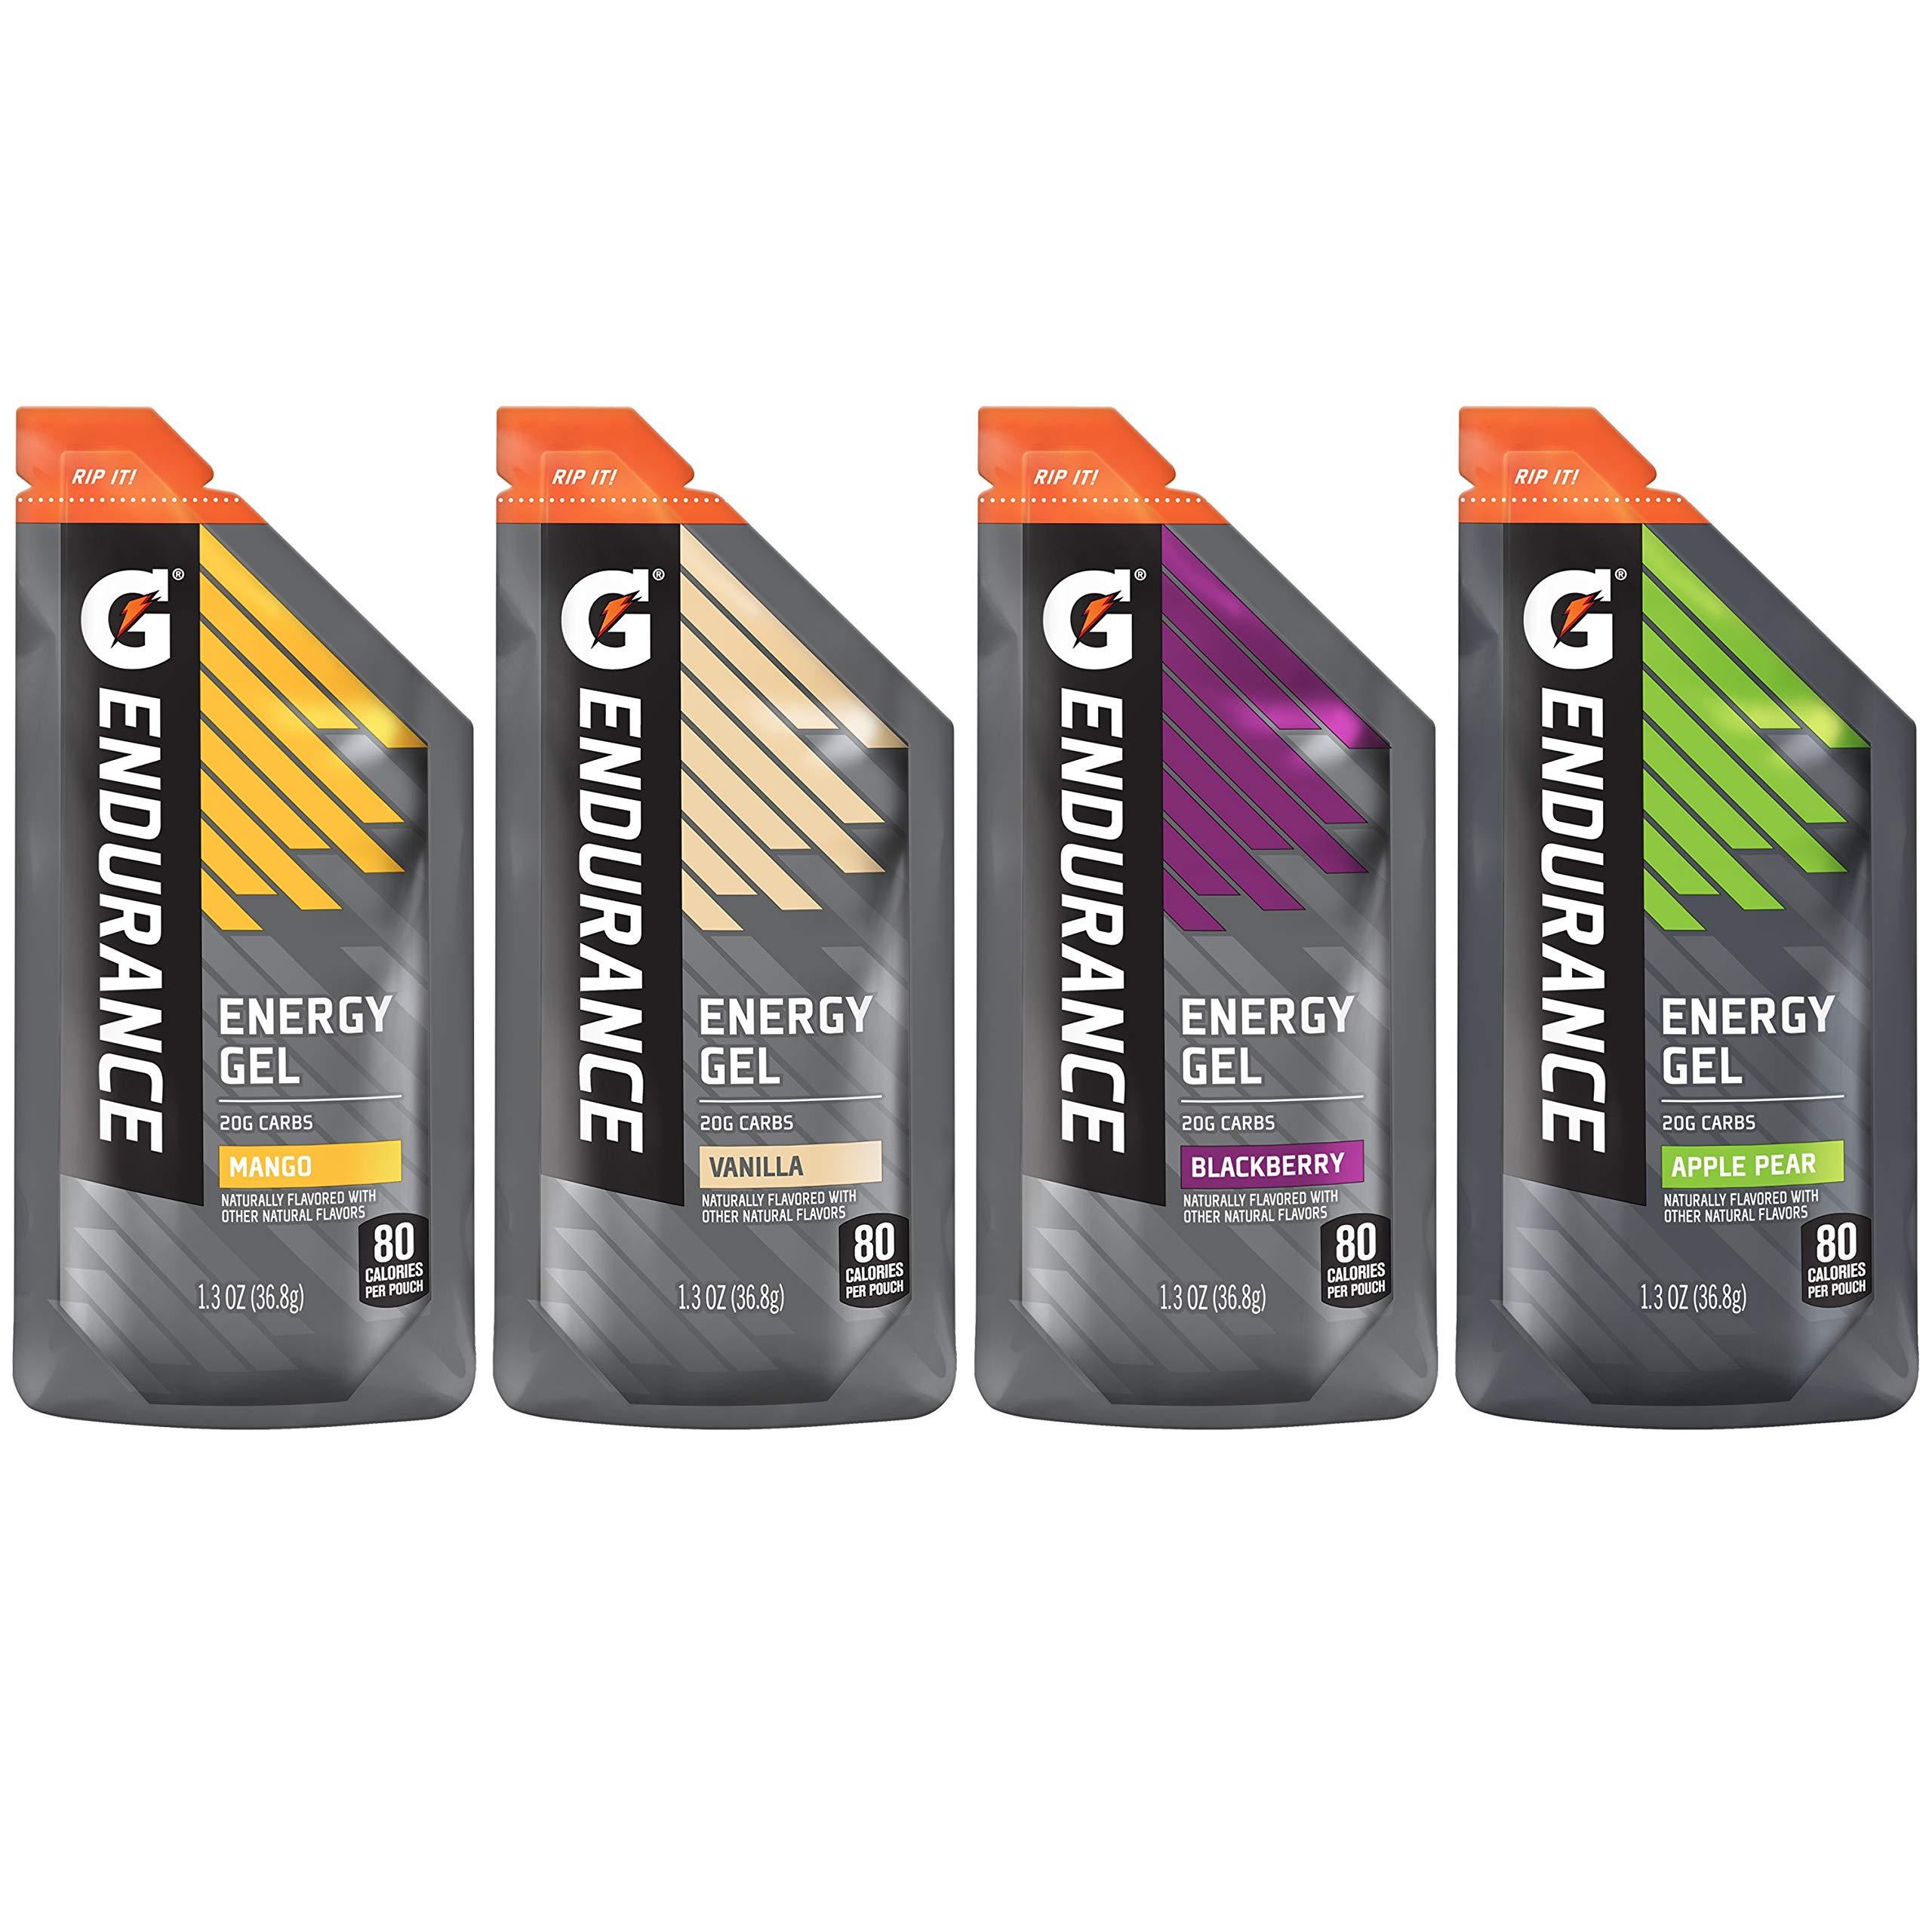 Gatorade Endurance Energy Gel, 4 Flavor Variety Pack, 1.3 Ounce, 12 Count